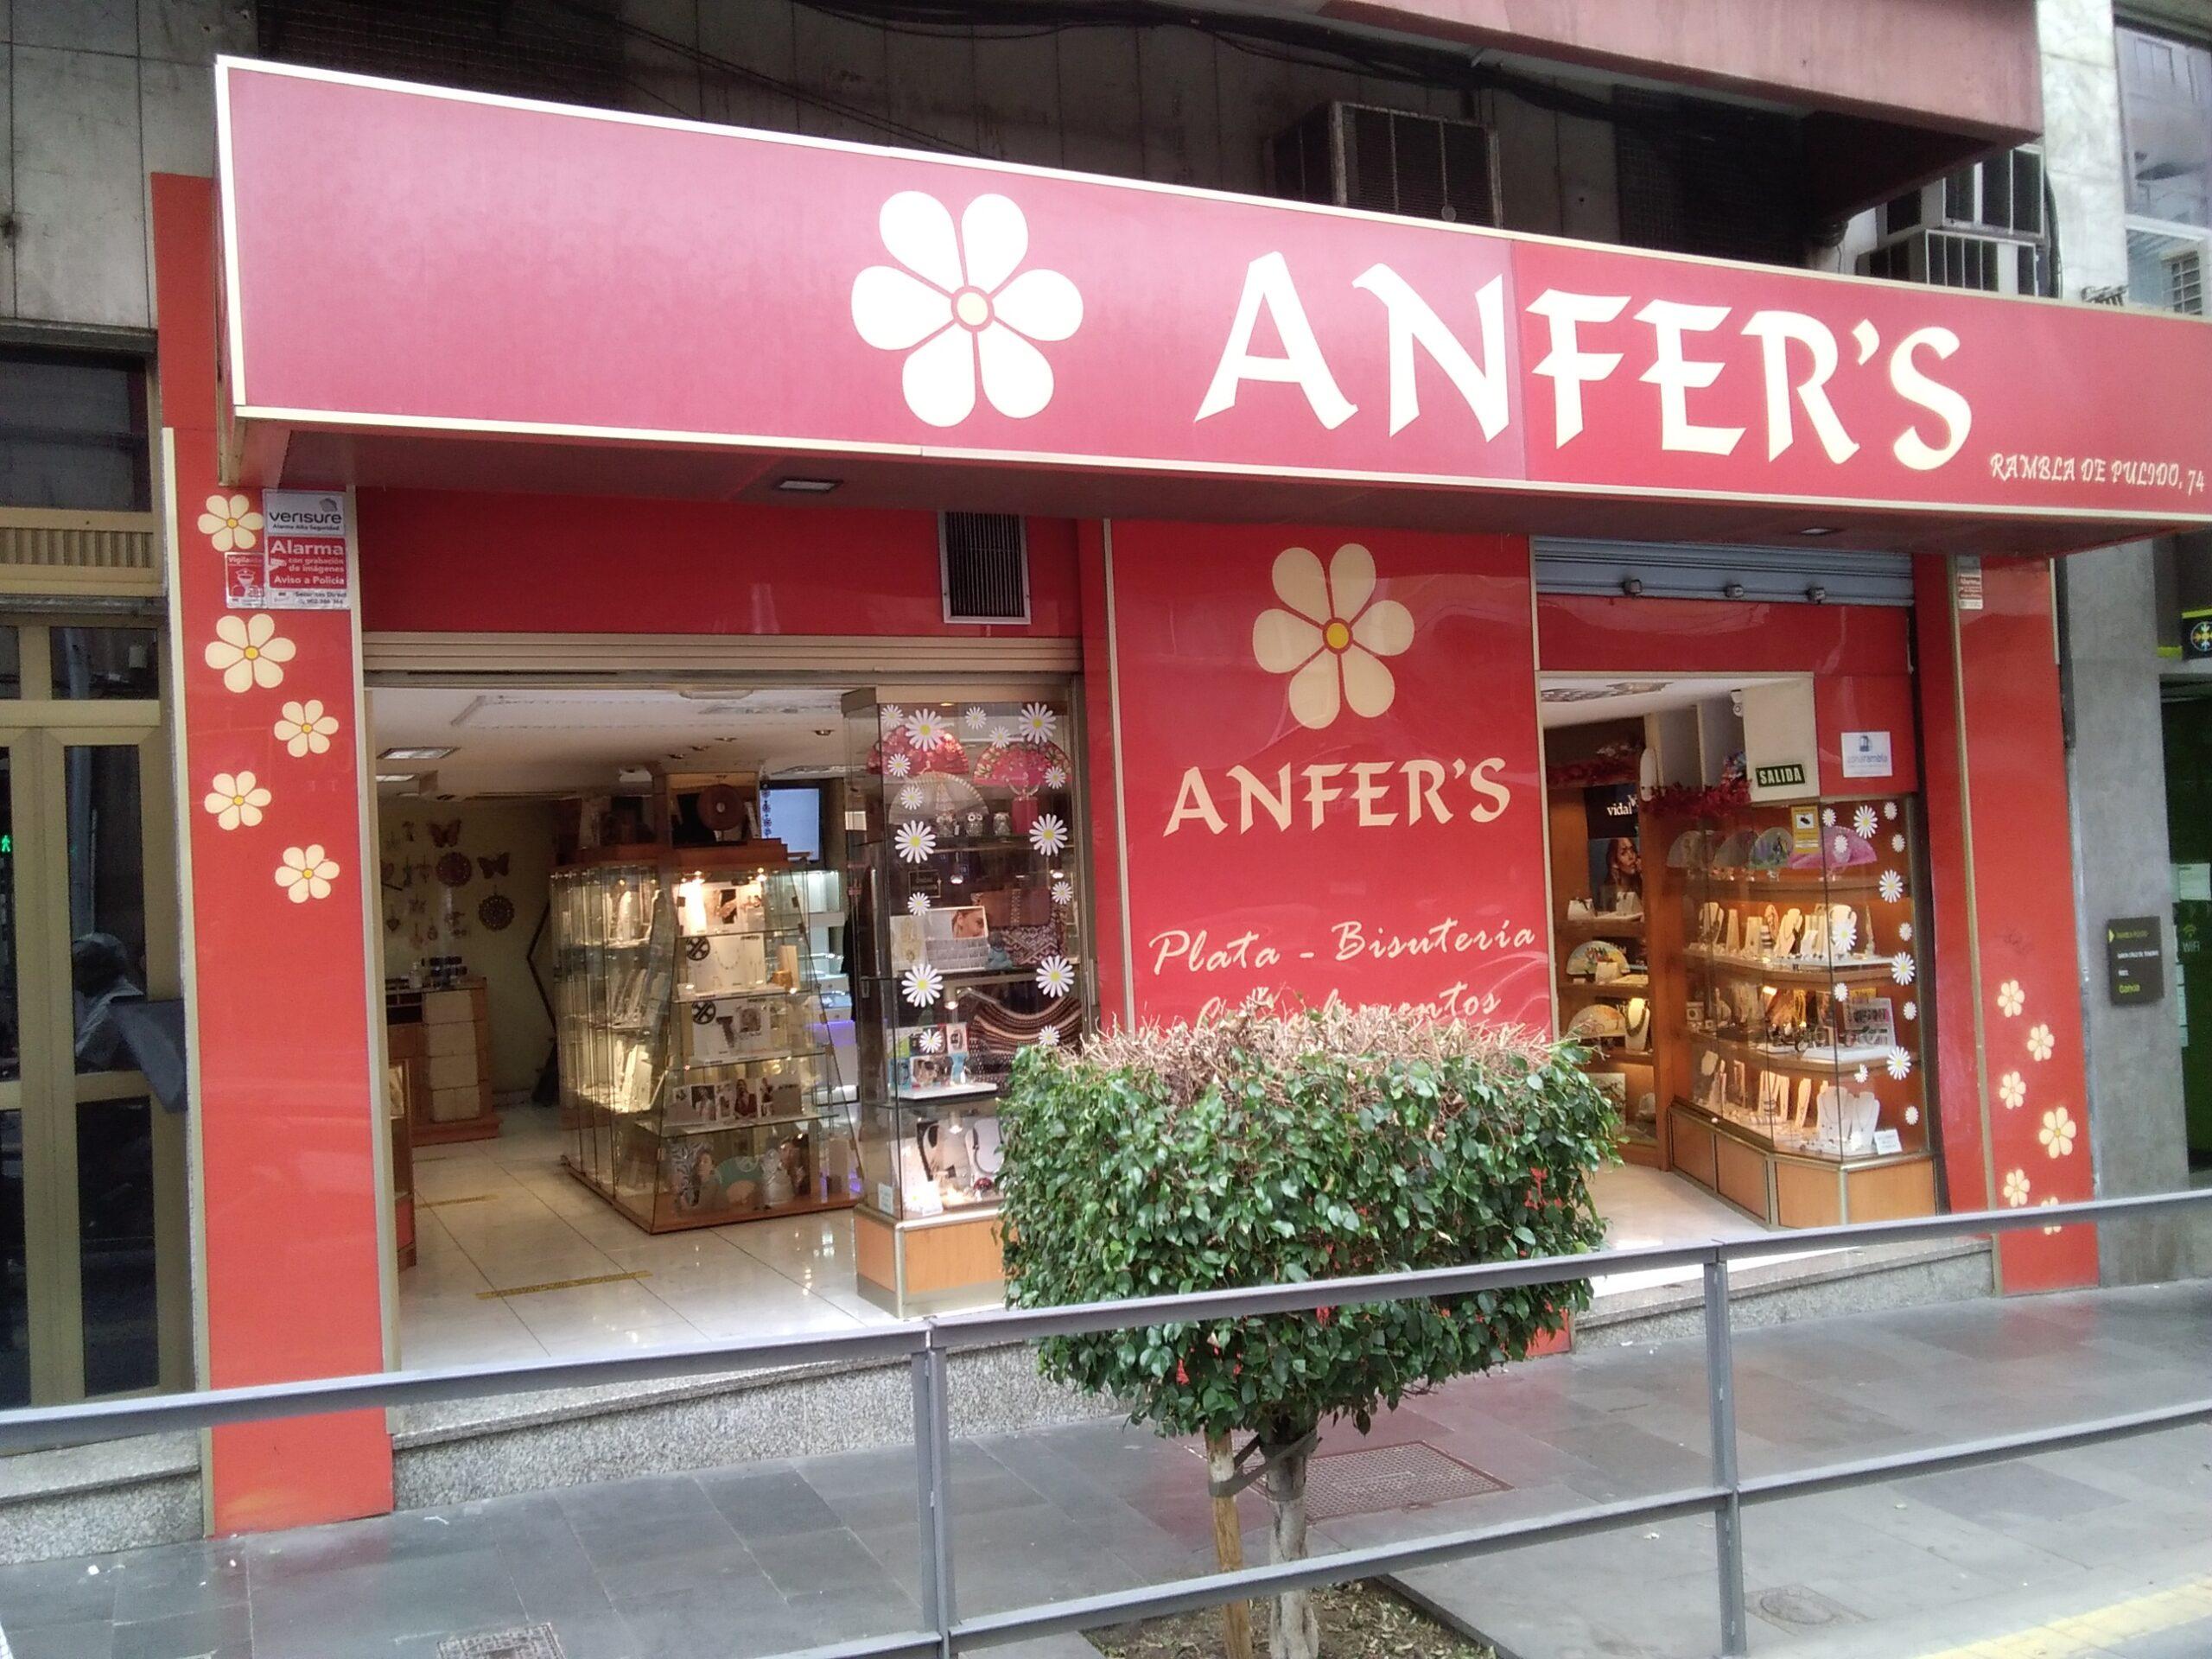 ANFER'S